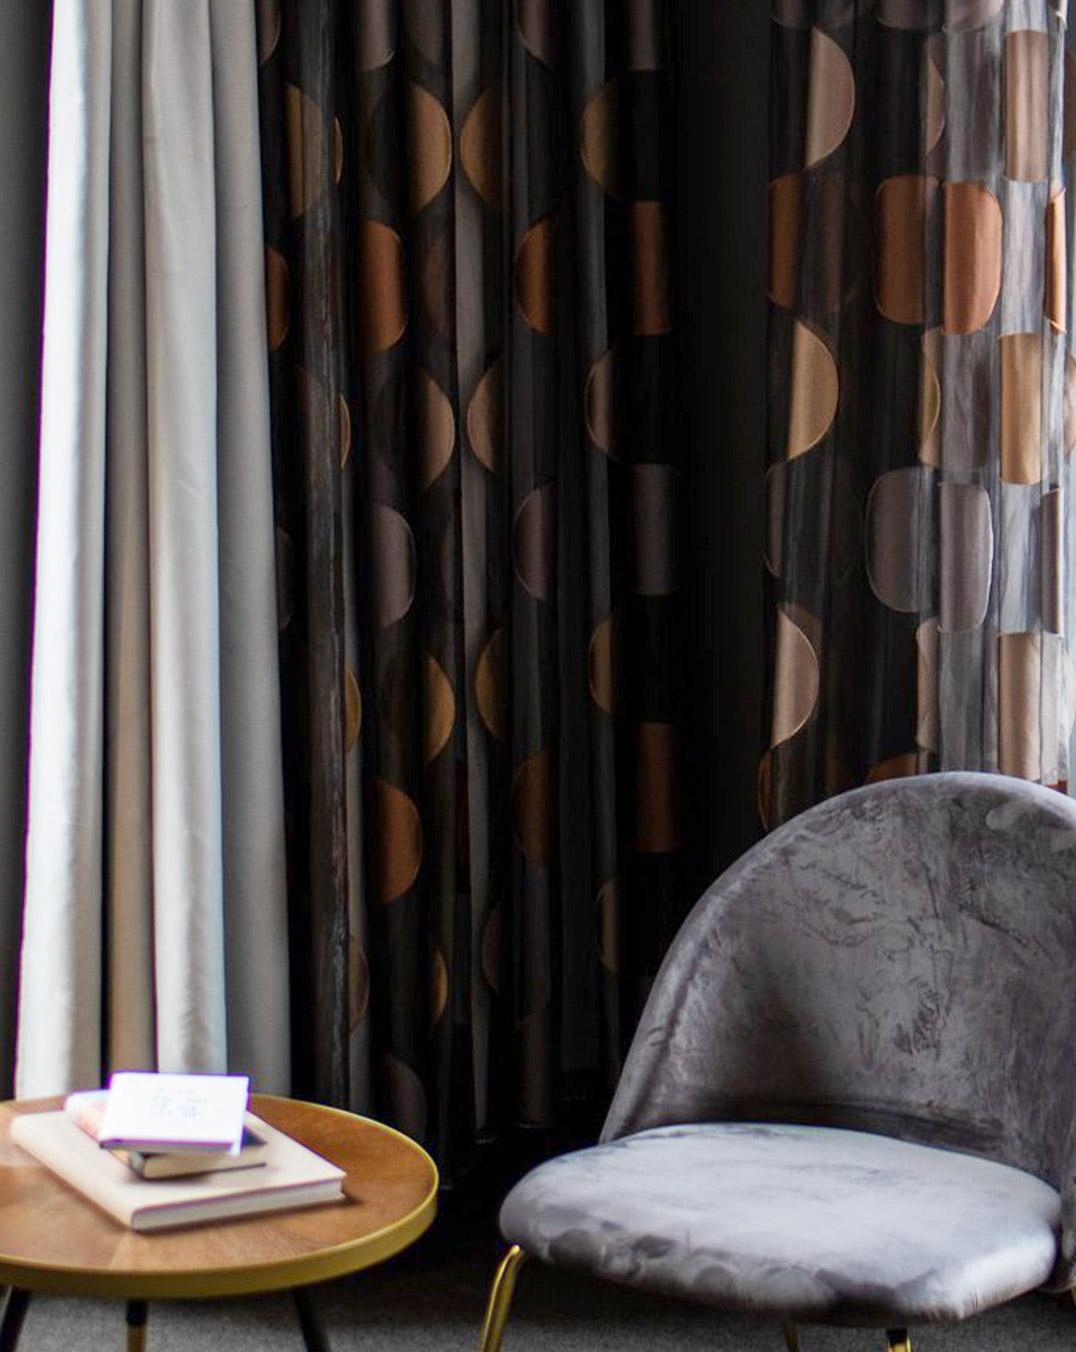 Koncept hotels - 1076x1352 - Body Image 4